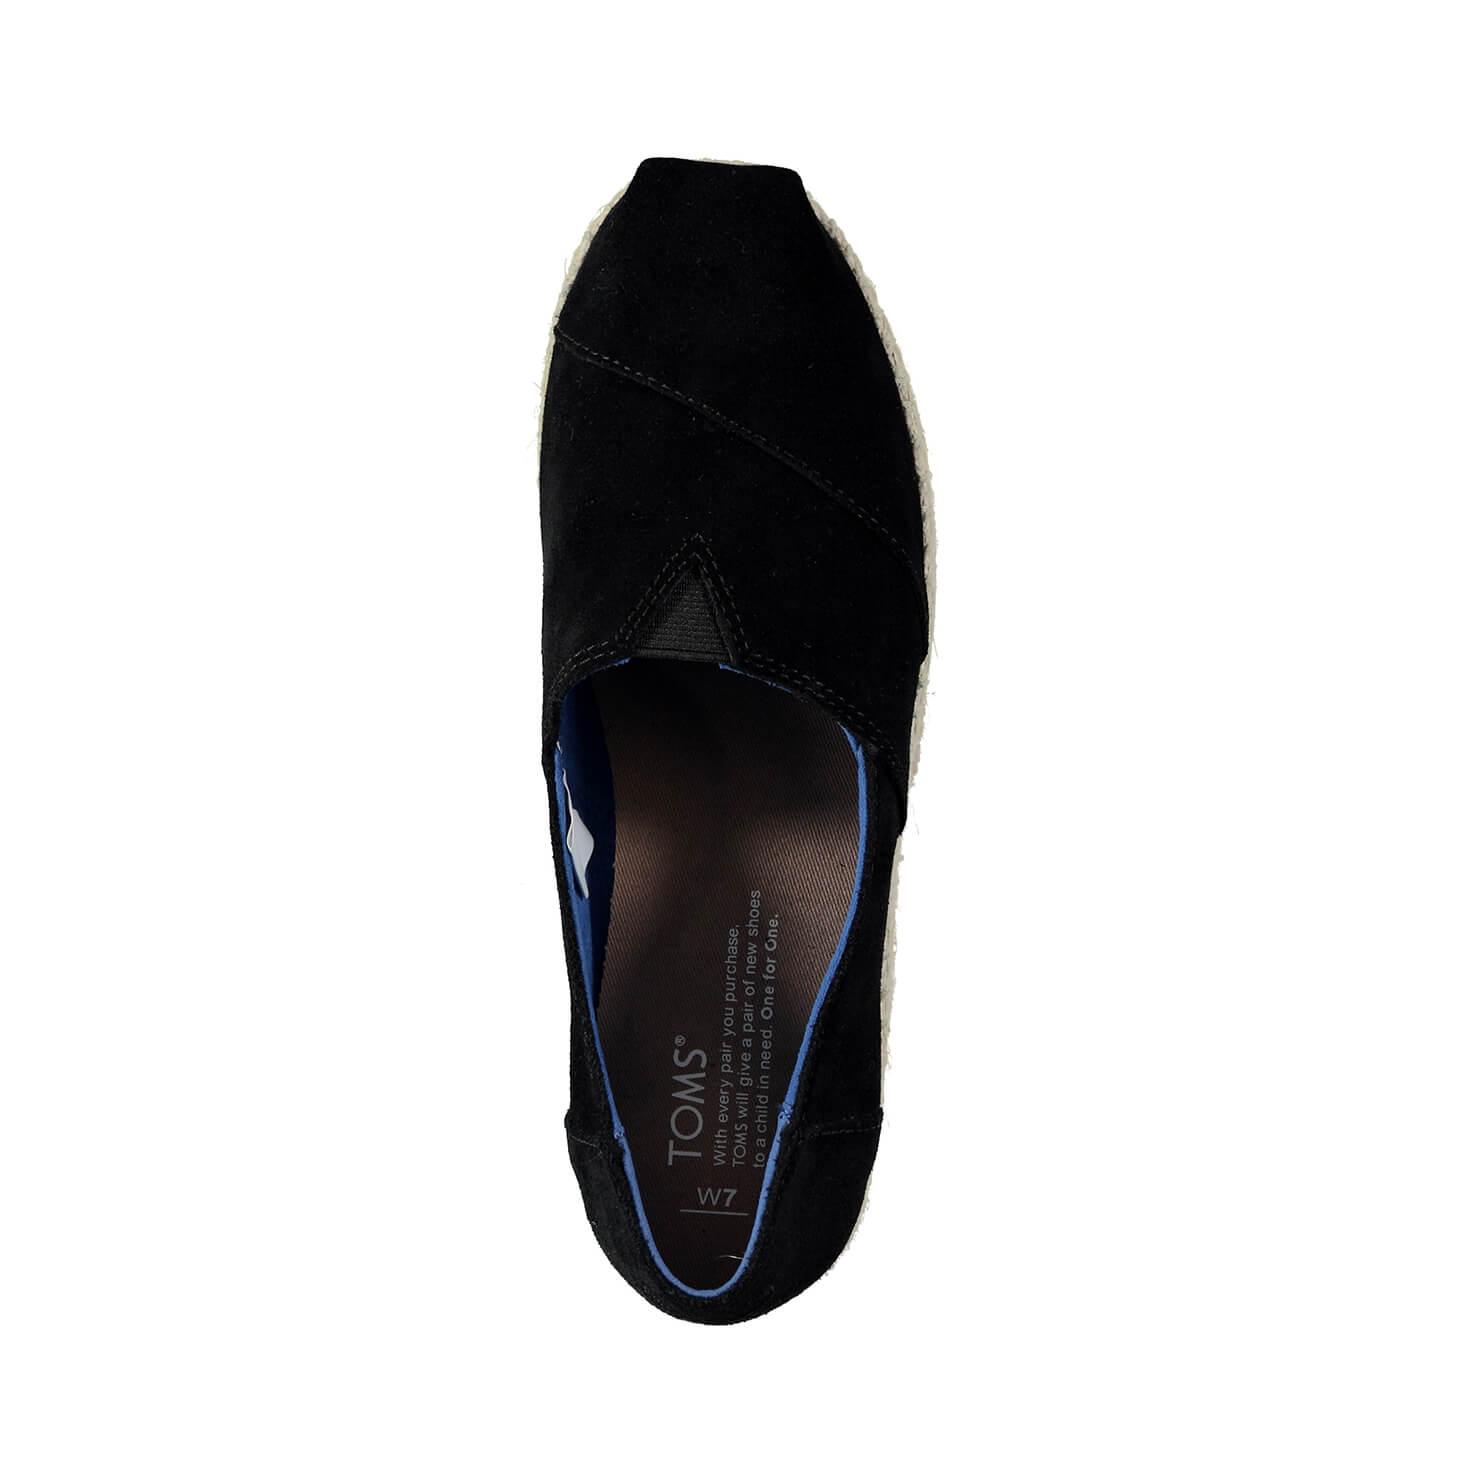 Toms Platform Alpargata Siyah Kadın Espadril